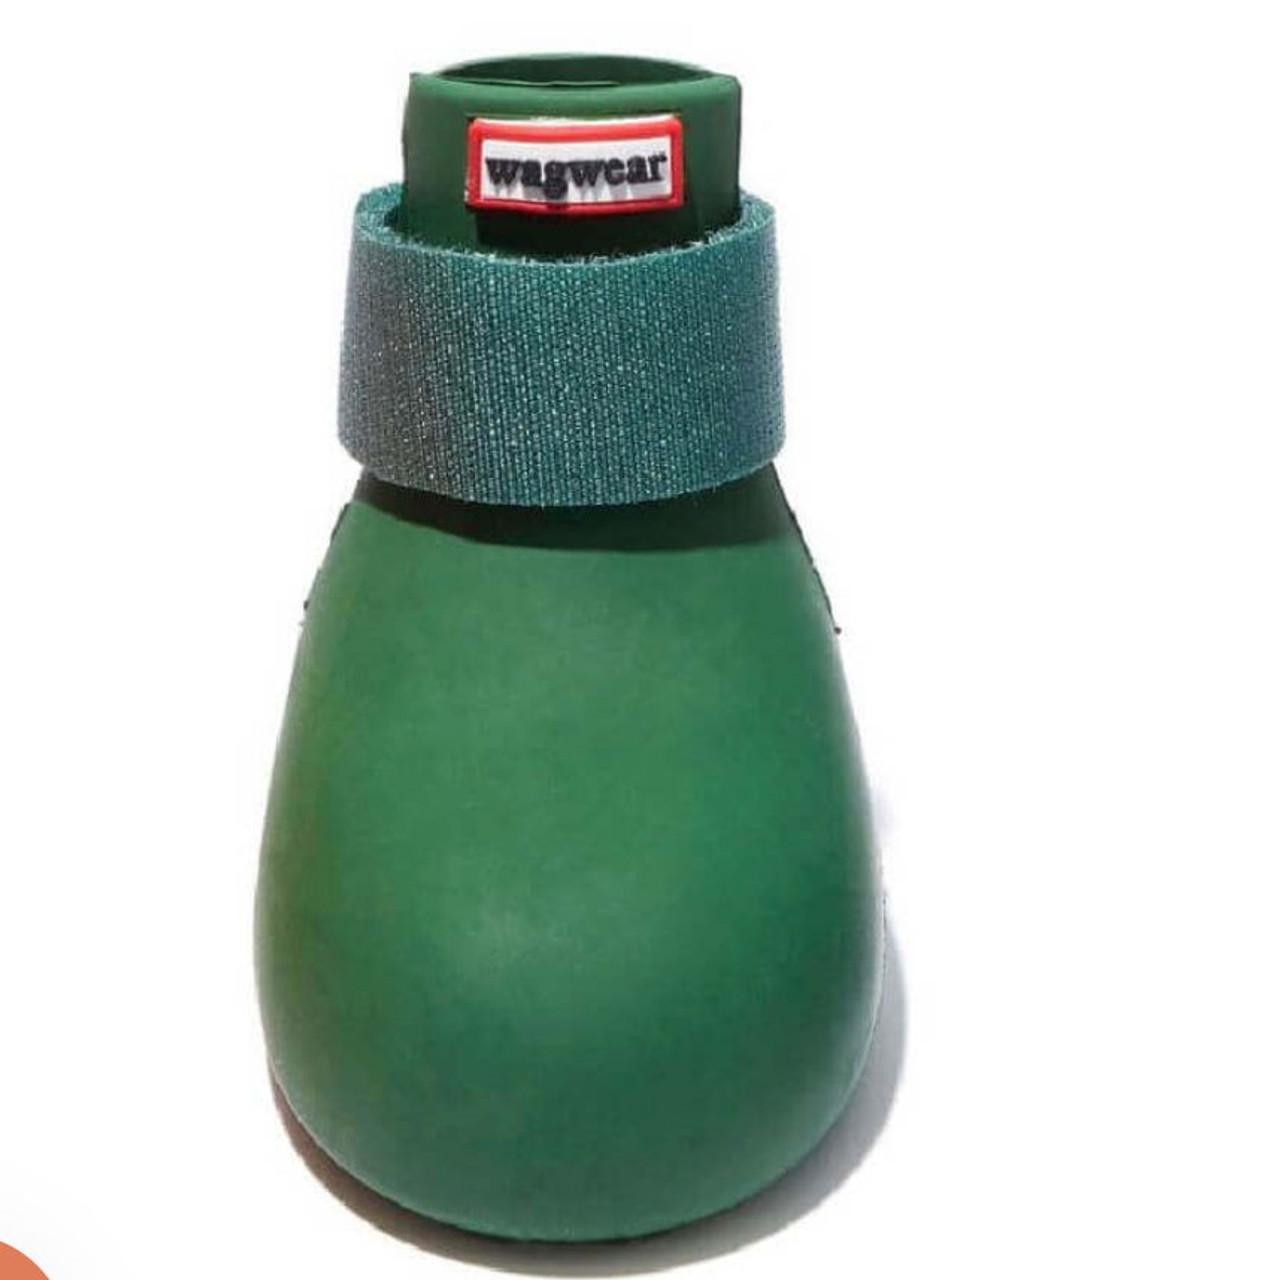 Wagwear - Dog Wellies - Rubber Rainboots (Set of 4) - Green - S (25-35lbs)